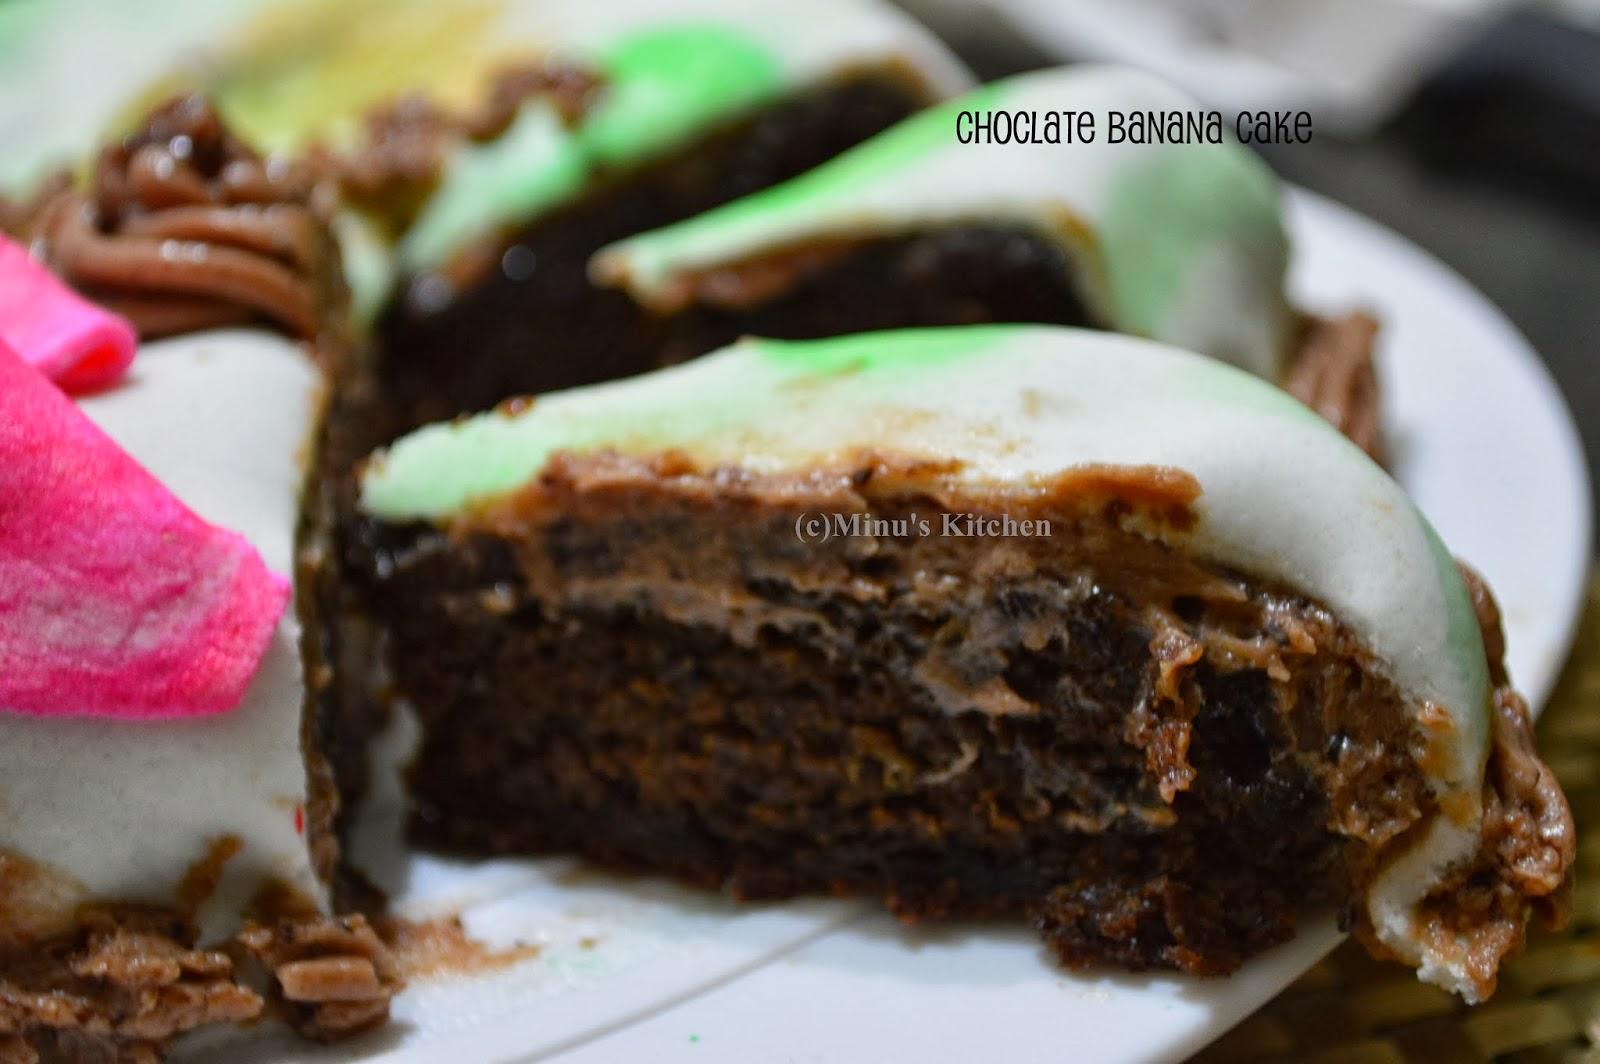 Pastry Cake Recipe In Malayalam: Chocolate Banana Cake With Marshmallow Fondant (Christmas